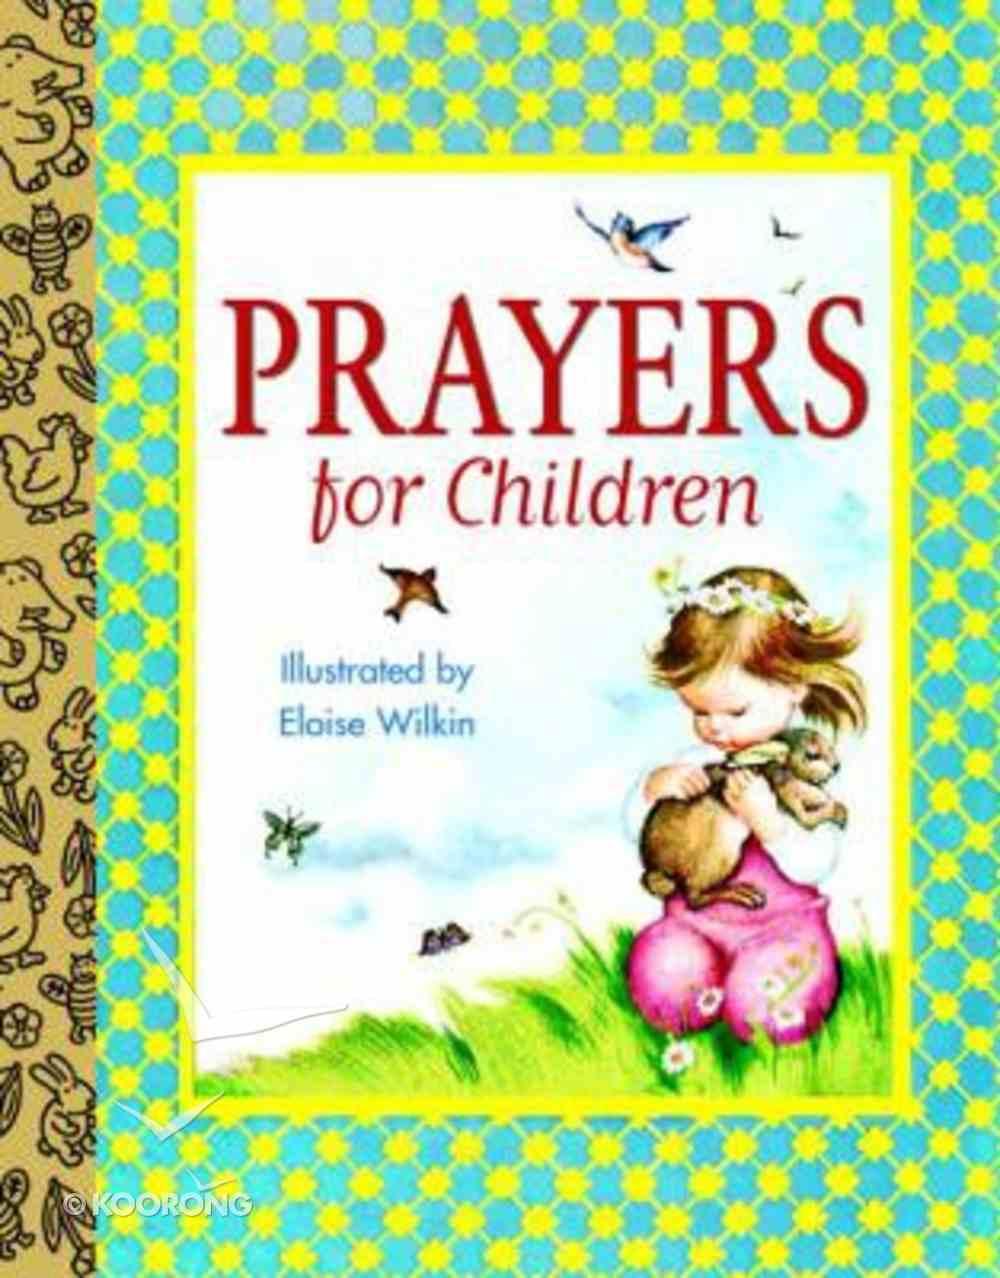 Prayers For Children (Golden Books Series) Board Book